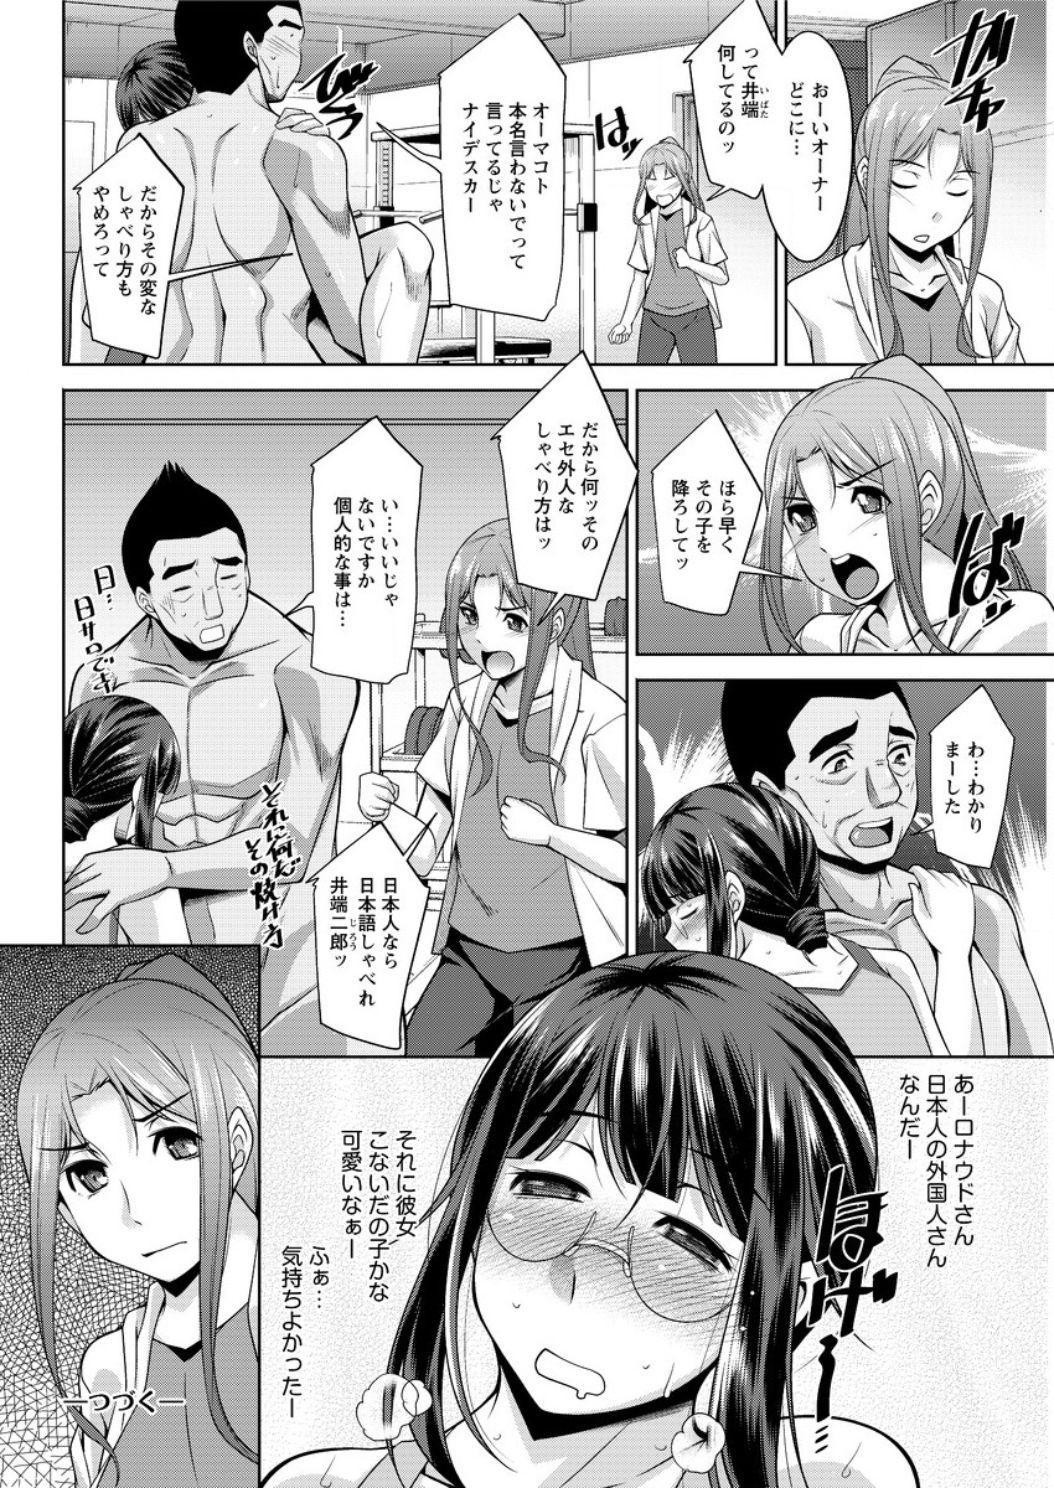 [zen9] Yacchae! Megumi-san | Do it! Megumi-san Ch 1-6 59